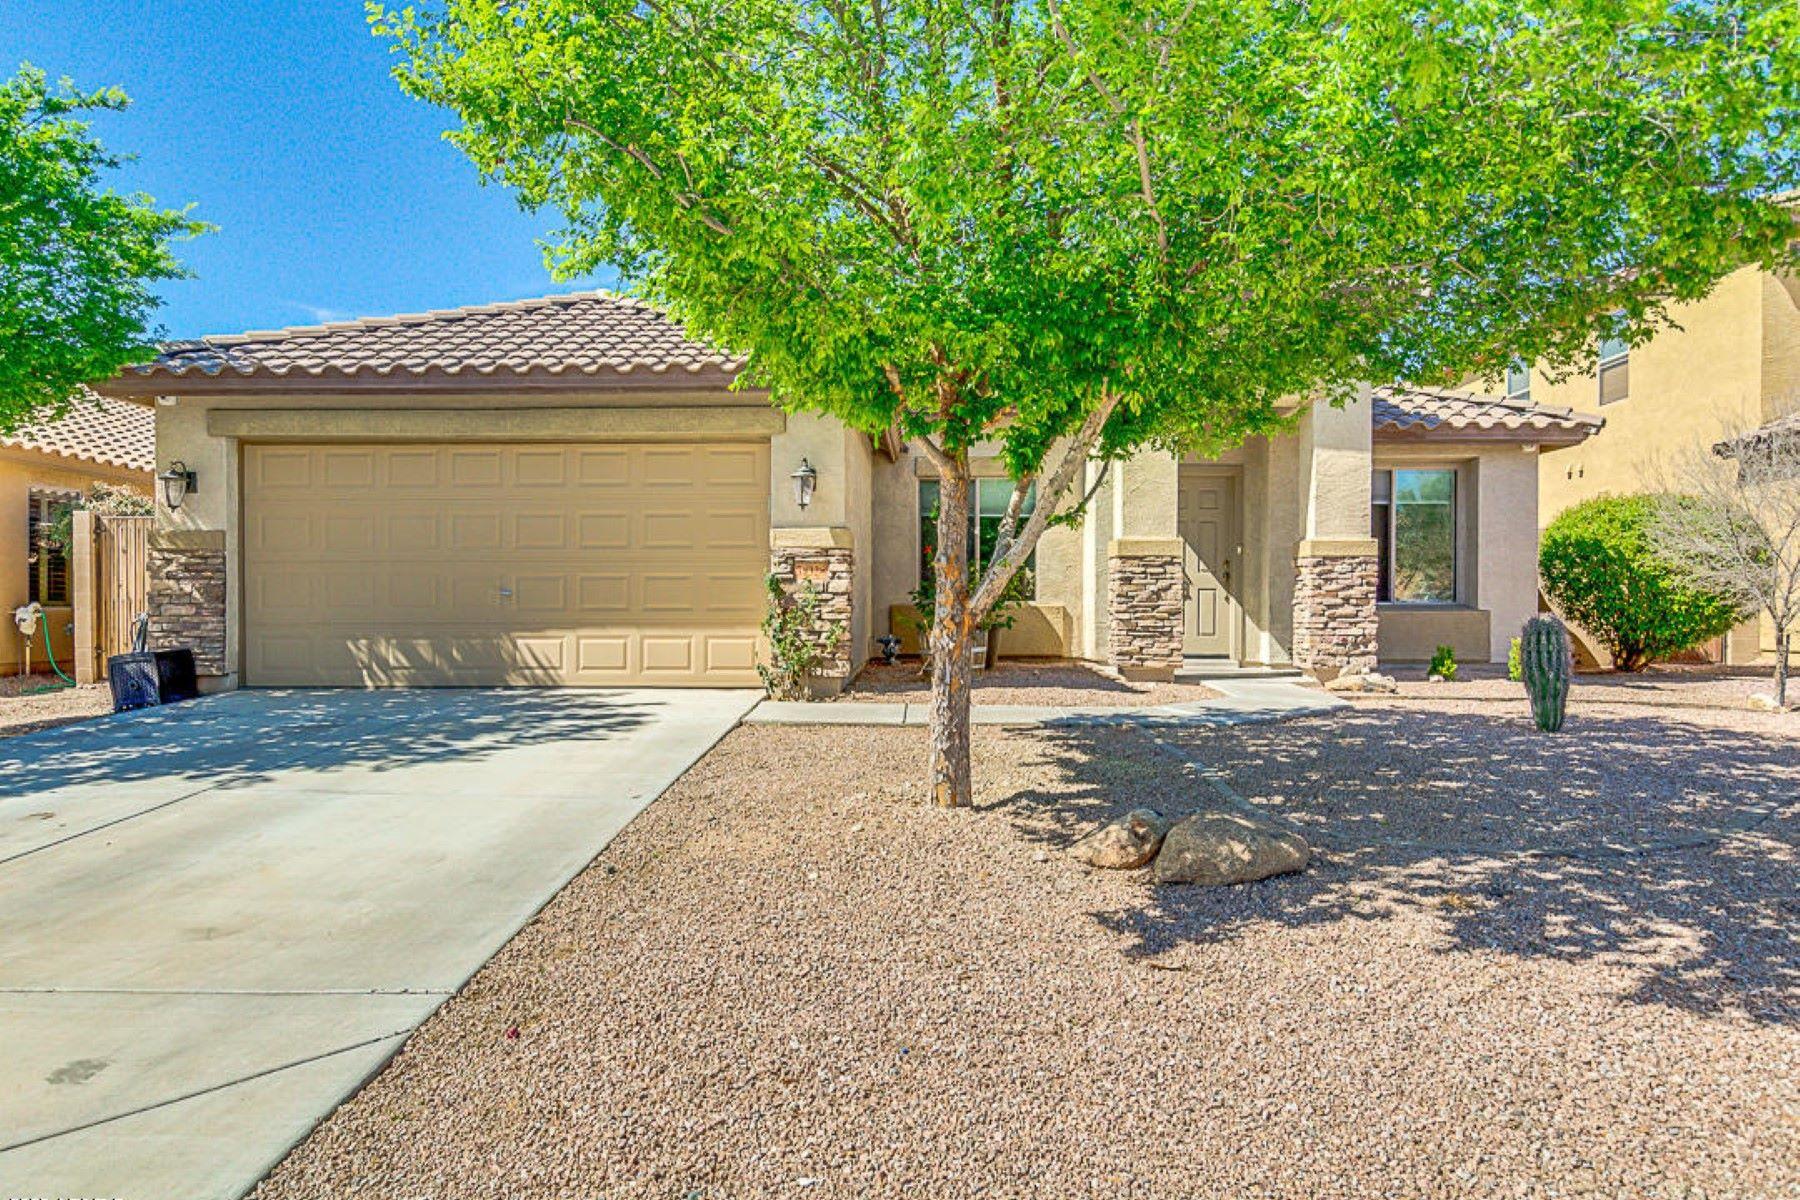 Single Family Homes for Active at Circle Cross Ranch 35328 N SHORTHORN TRL San Tan Valley, Arizona 85143 United States